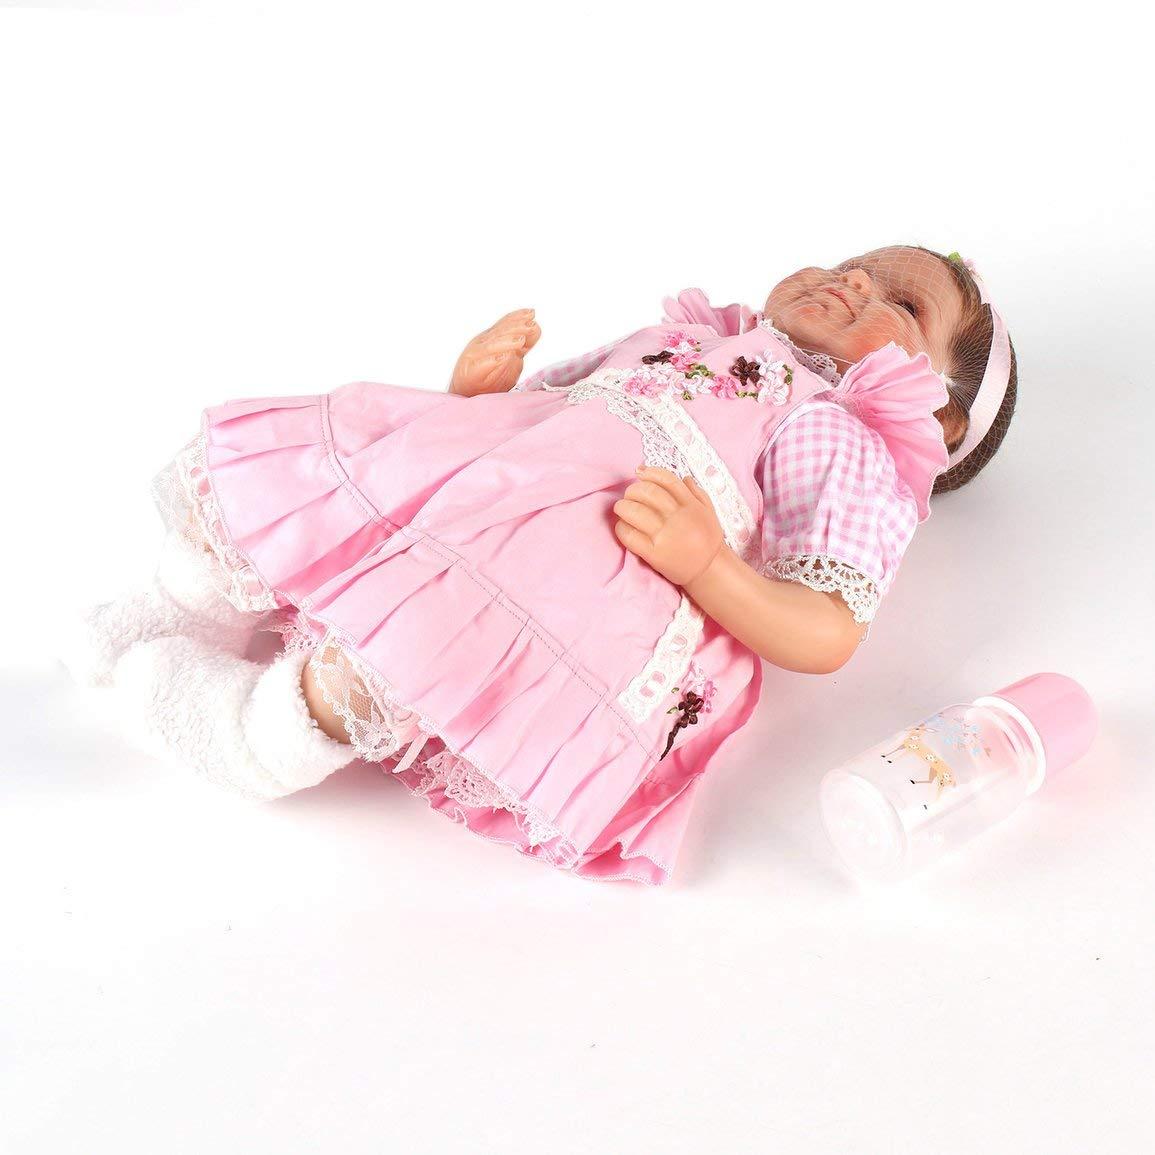 Fantasyworld Fantasyworld Fantasyworld Mädchen Lächeln Realistische Naturgetreue Silikon Reborn Neugeborenes Baby Doll Re-Alike Play House Toy Exquisite Geburtstagsgeschenk 4f3930